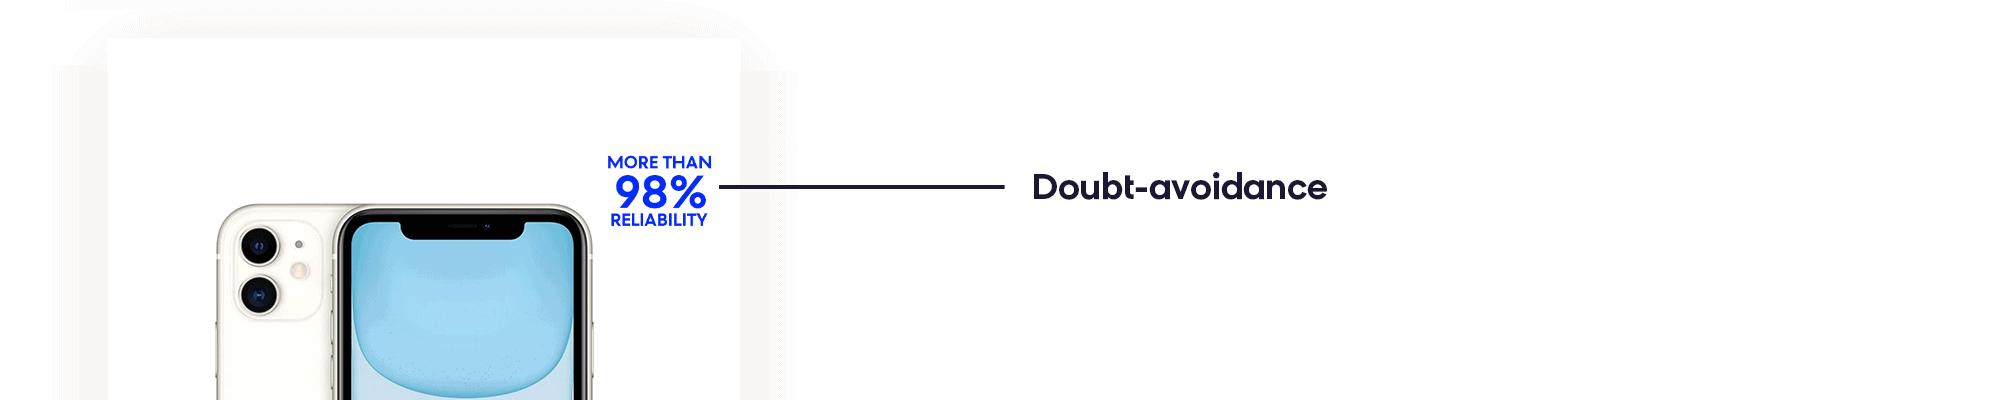 consumer behavior - doubt avoidance